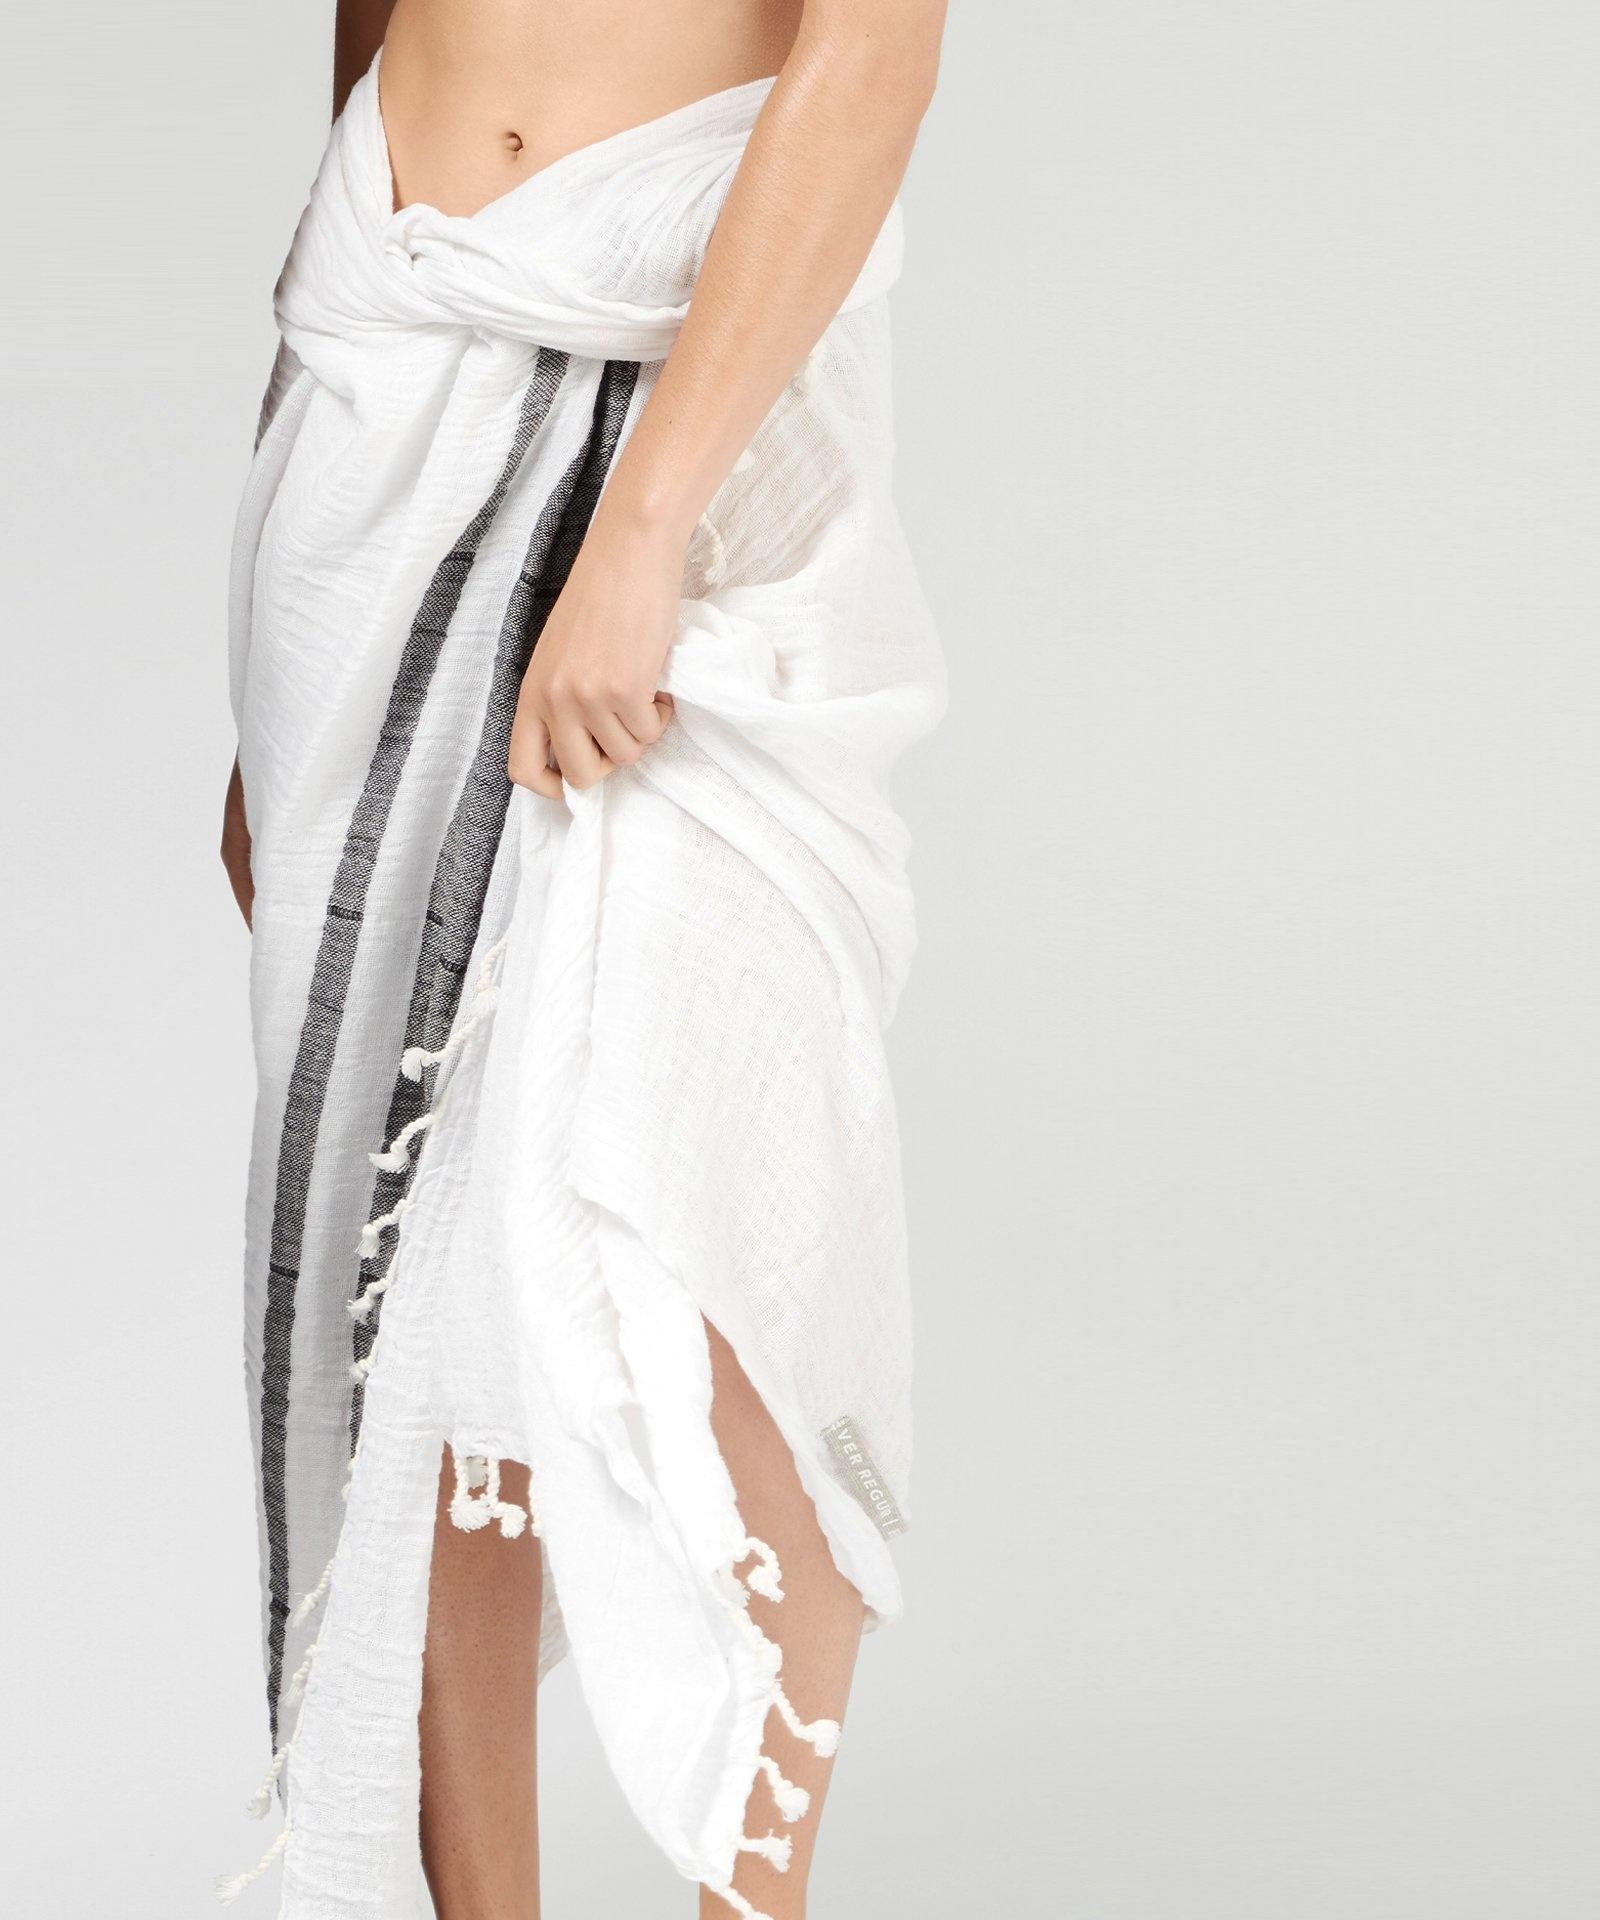 Handdoek hamam towel white-2